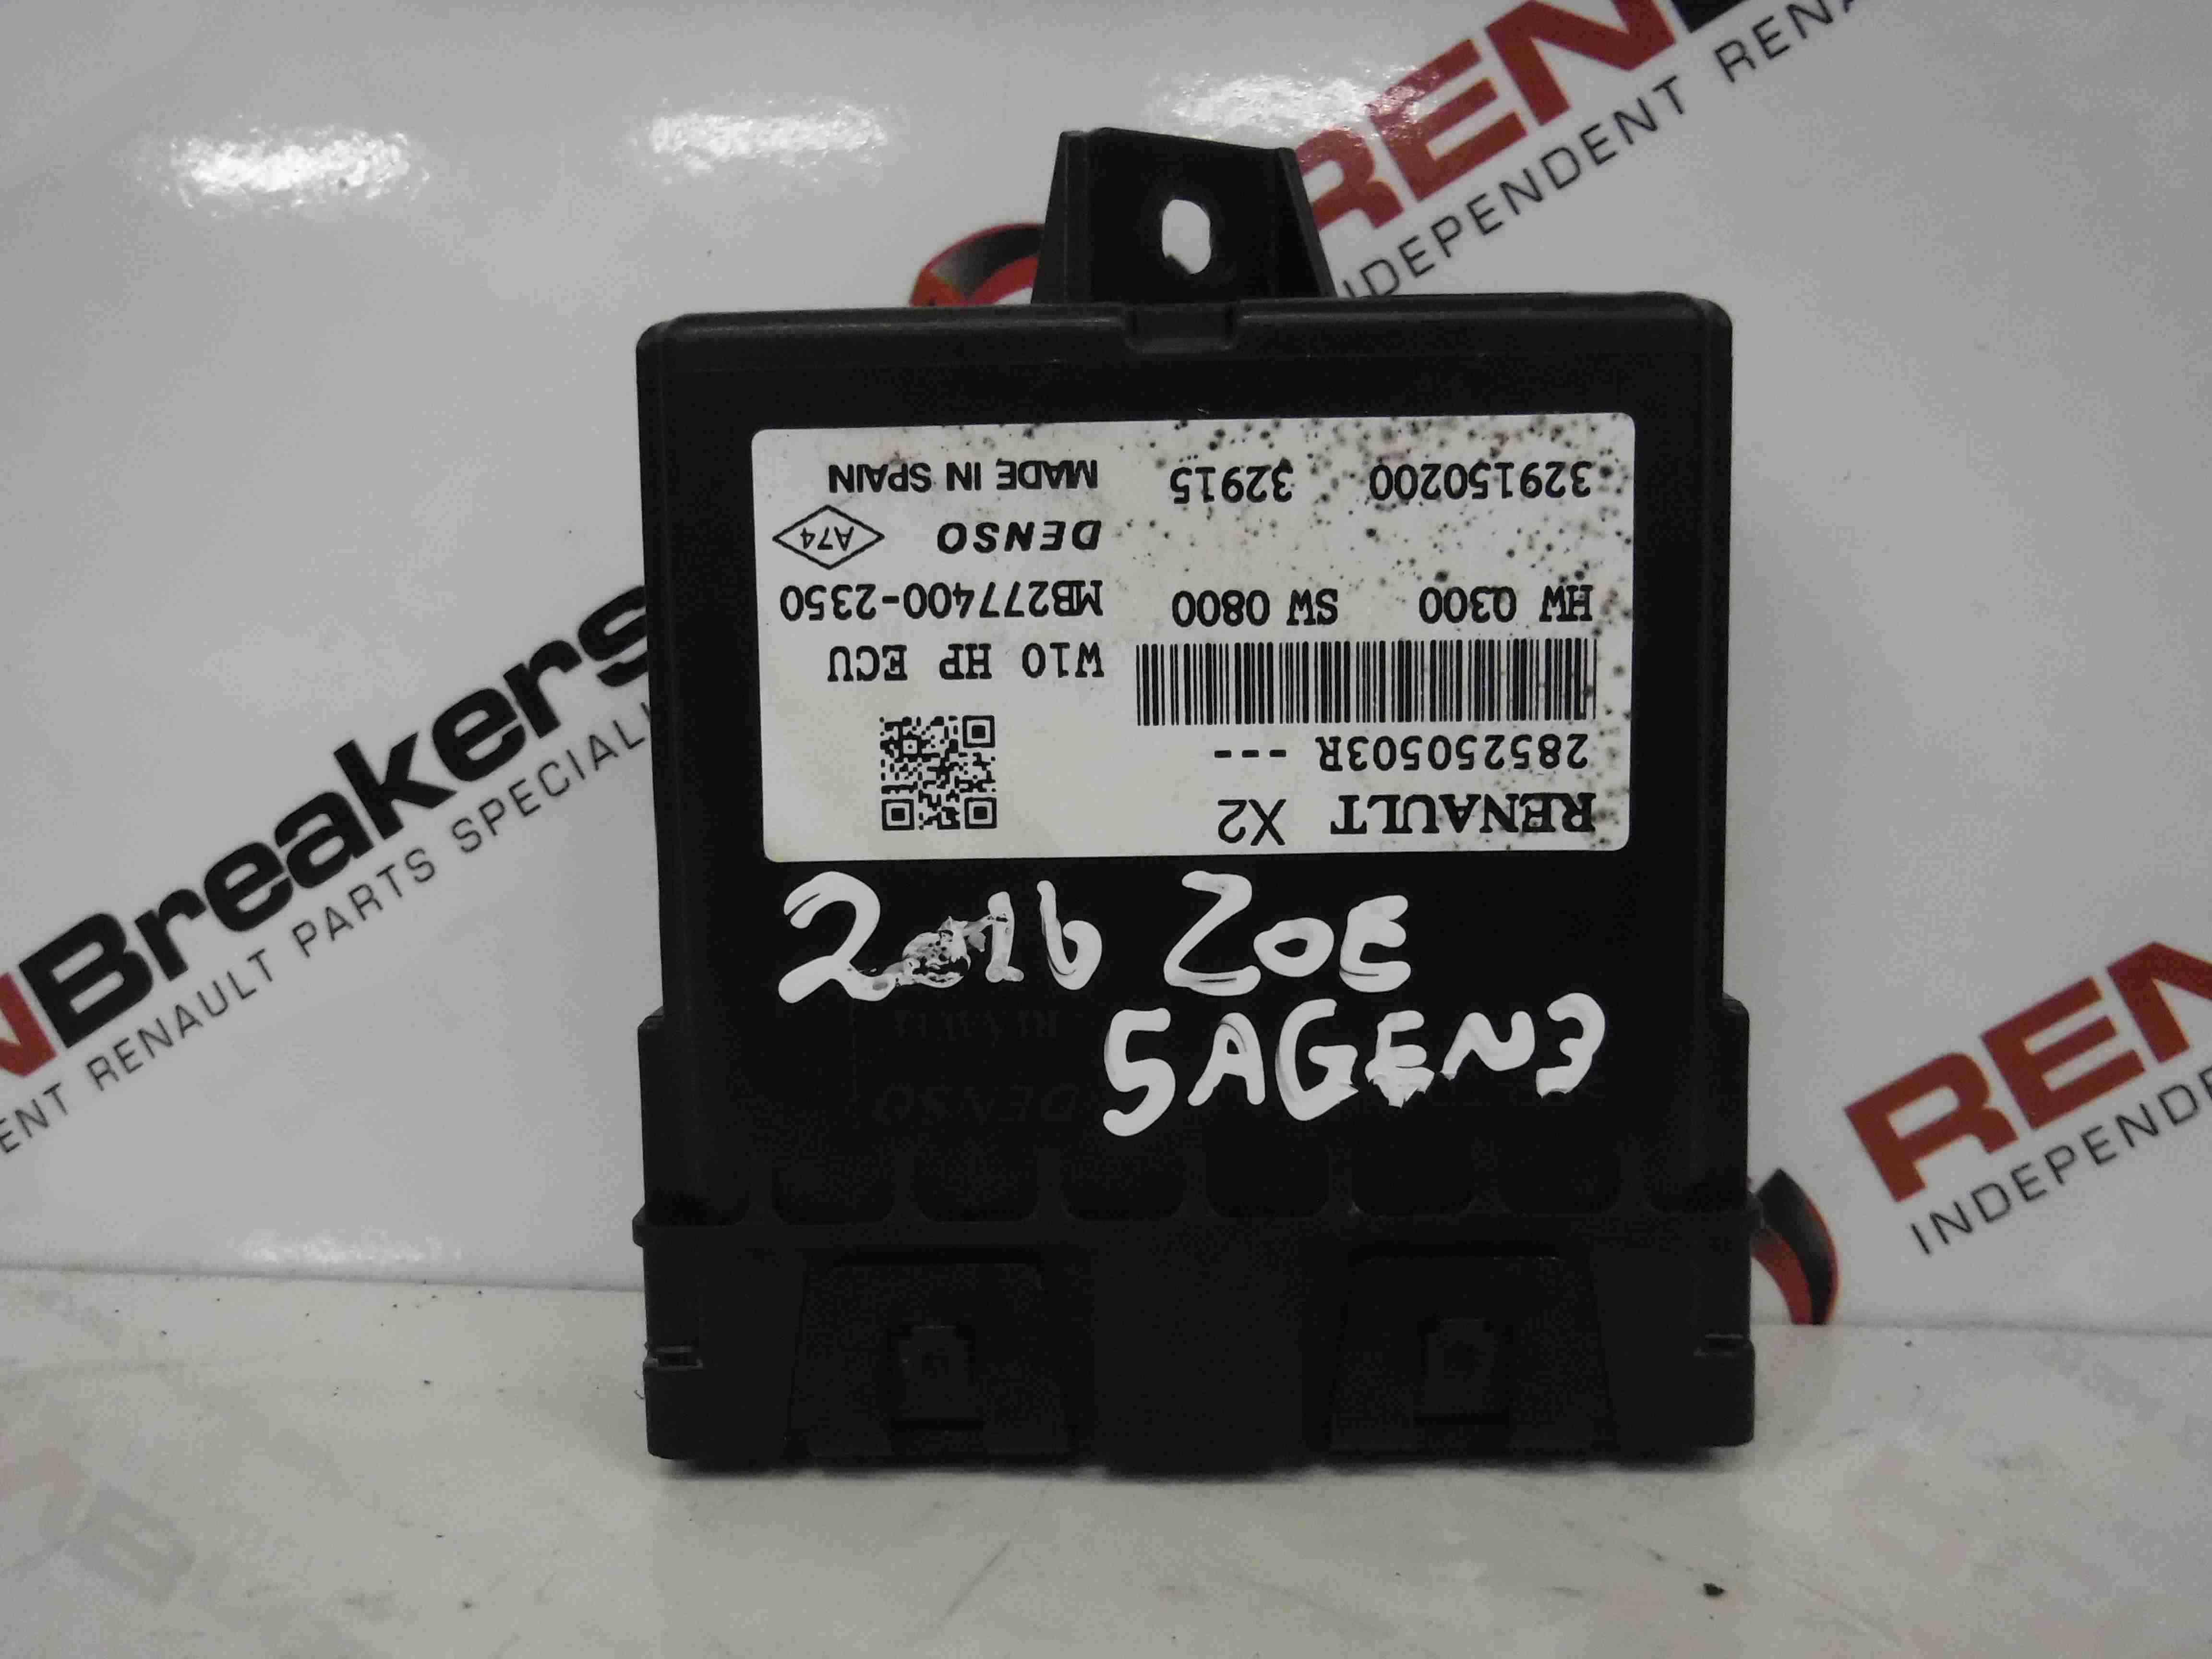 Renault Zoe 2012-2016 Air Conditioning ECU Module Climate 285250503R